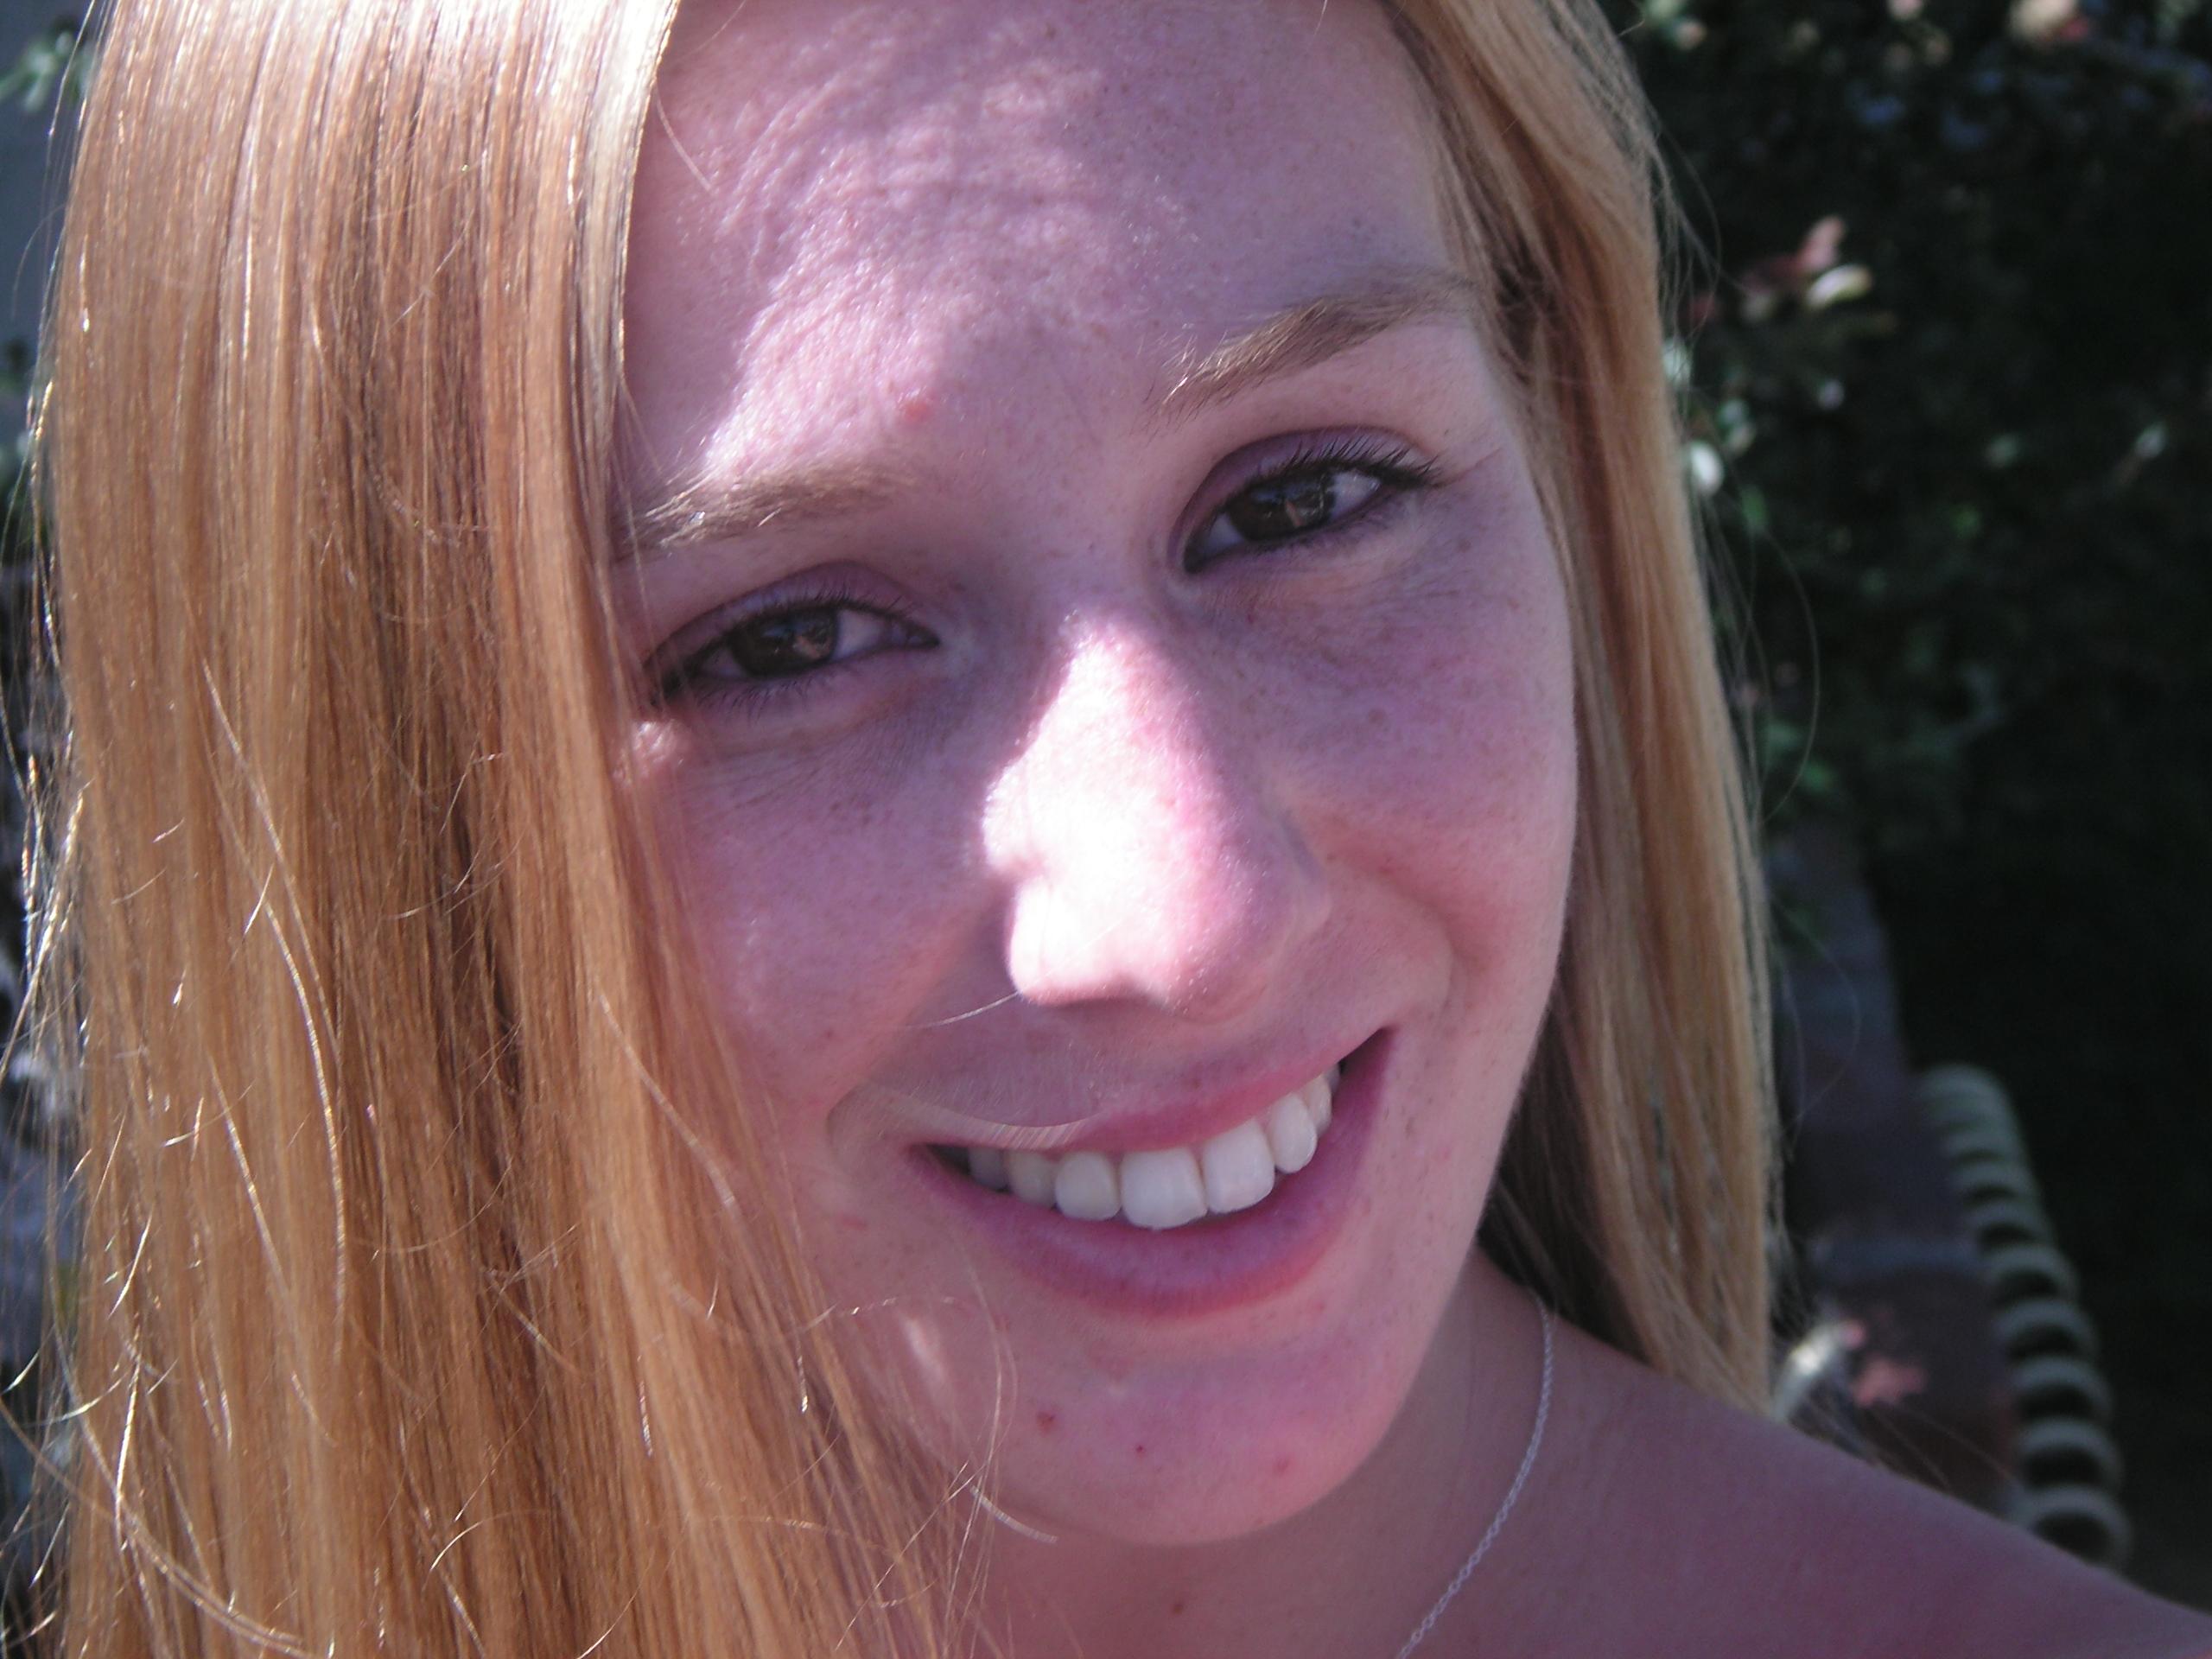 Samantha Espolt